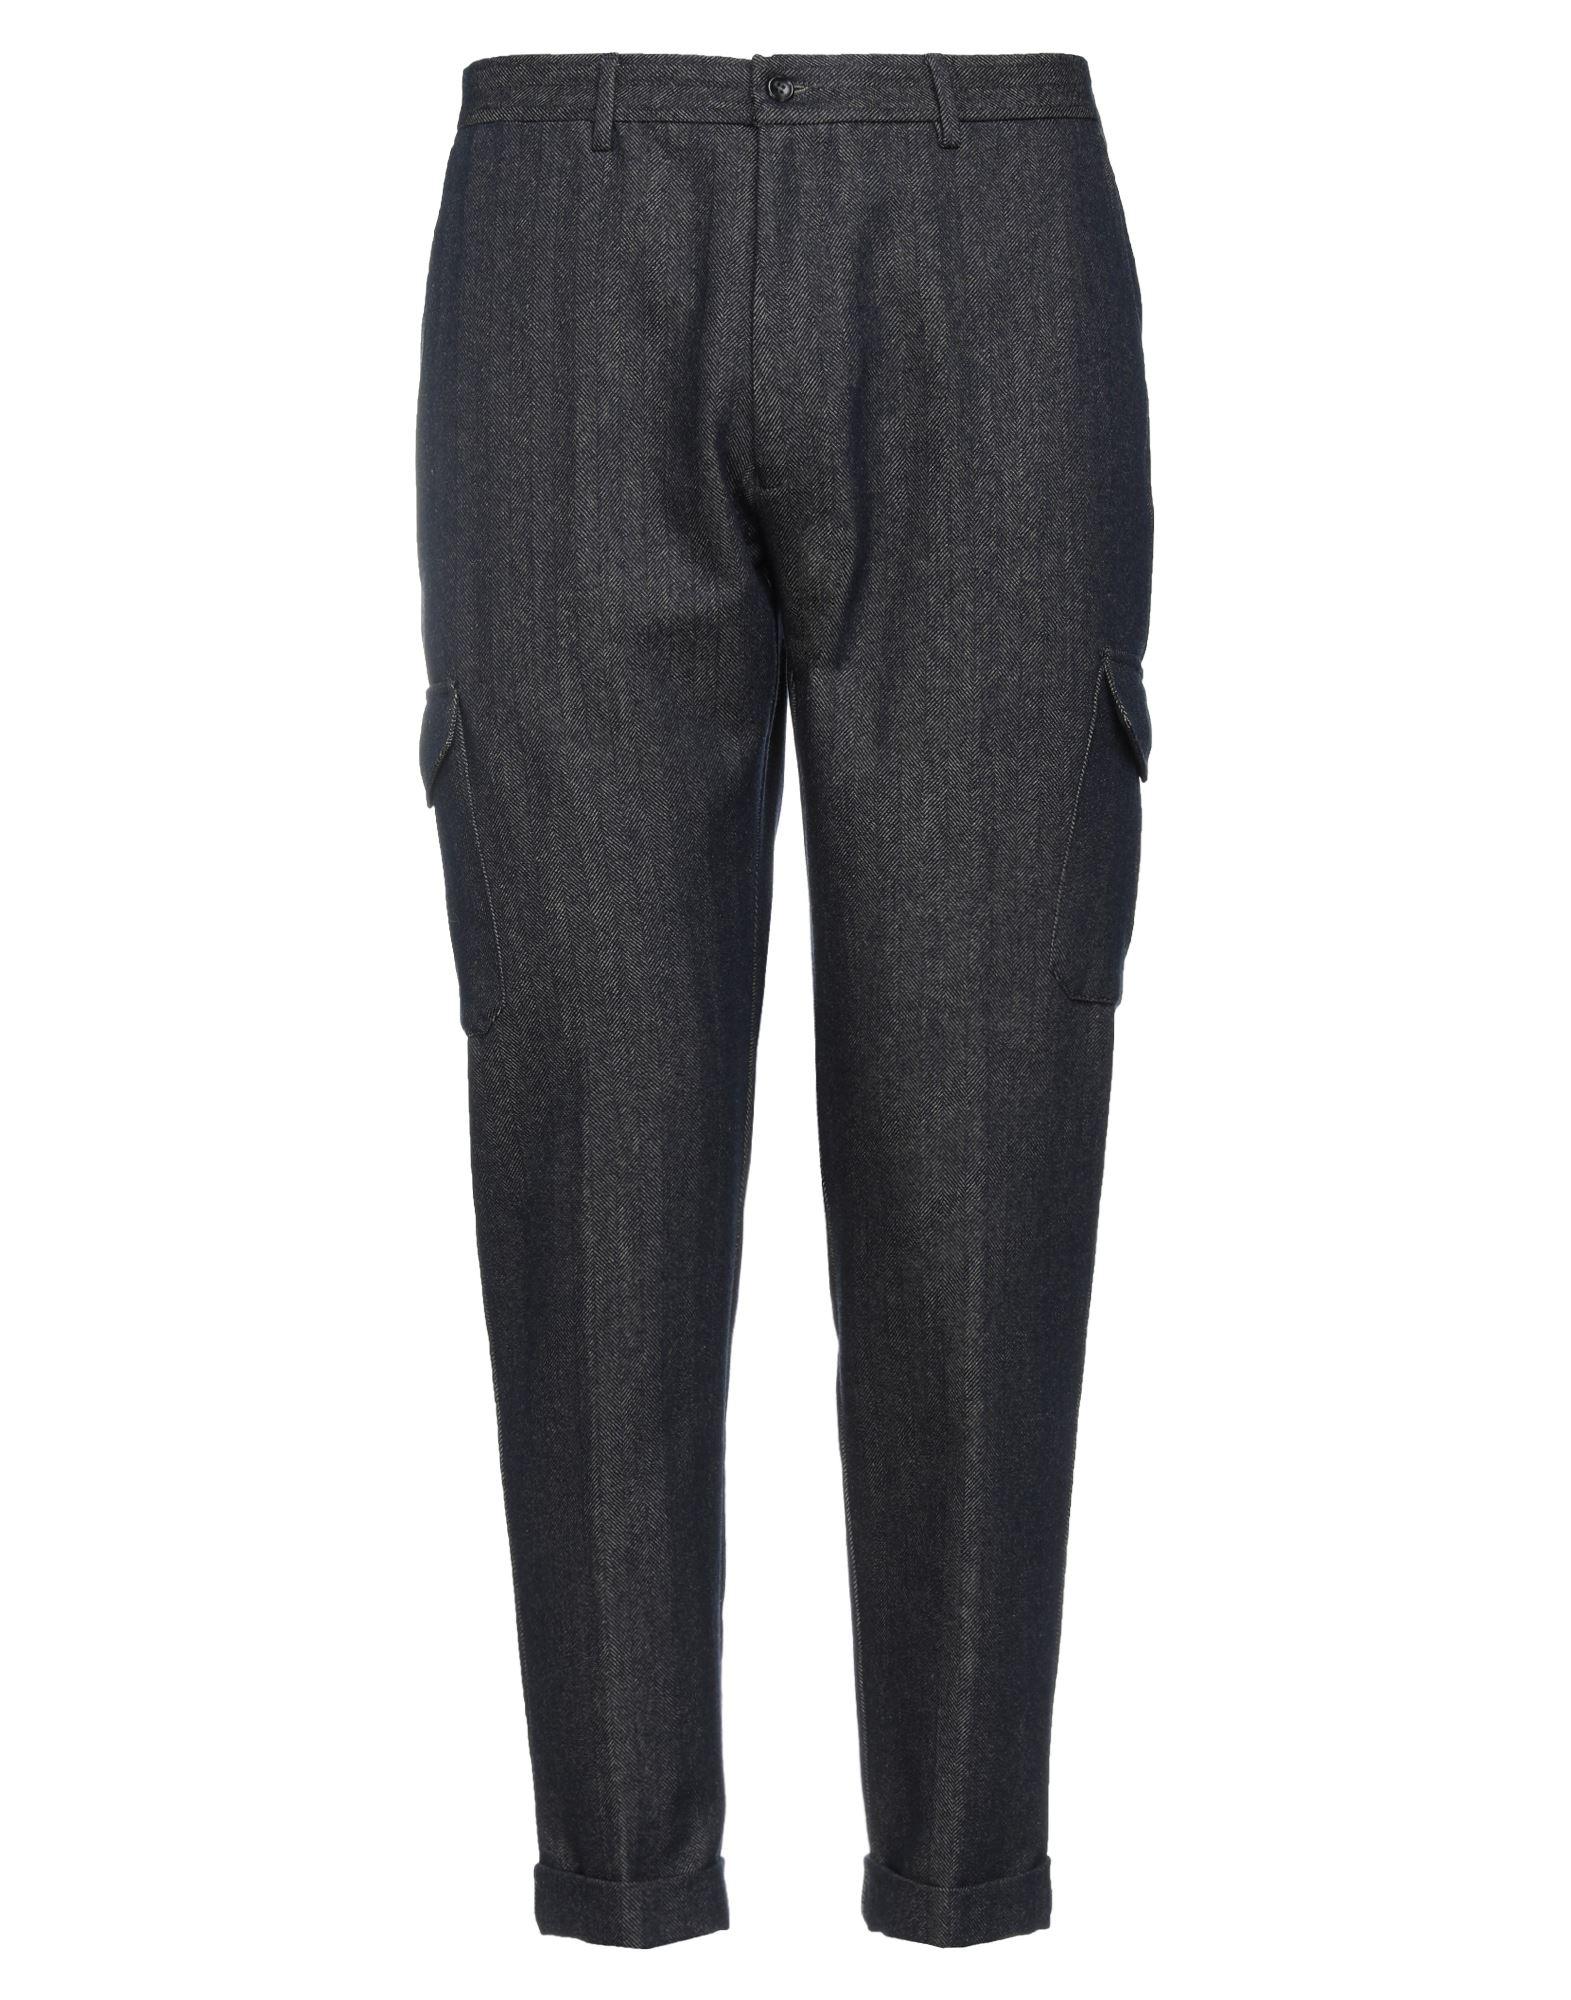 BARBA Napoli Повседневные брюки barba napoli повседневные брюки